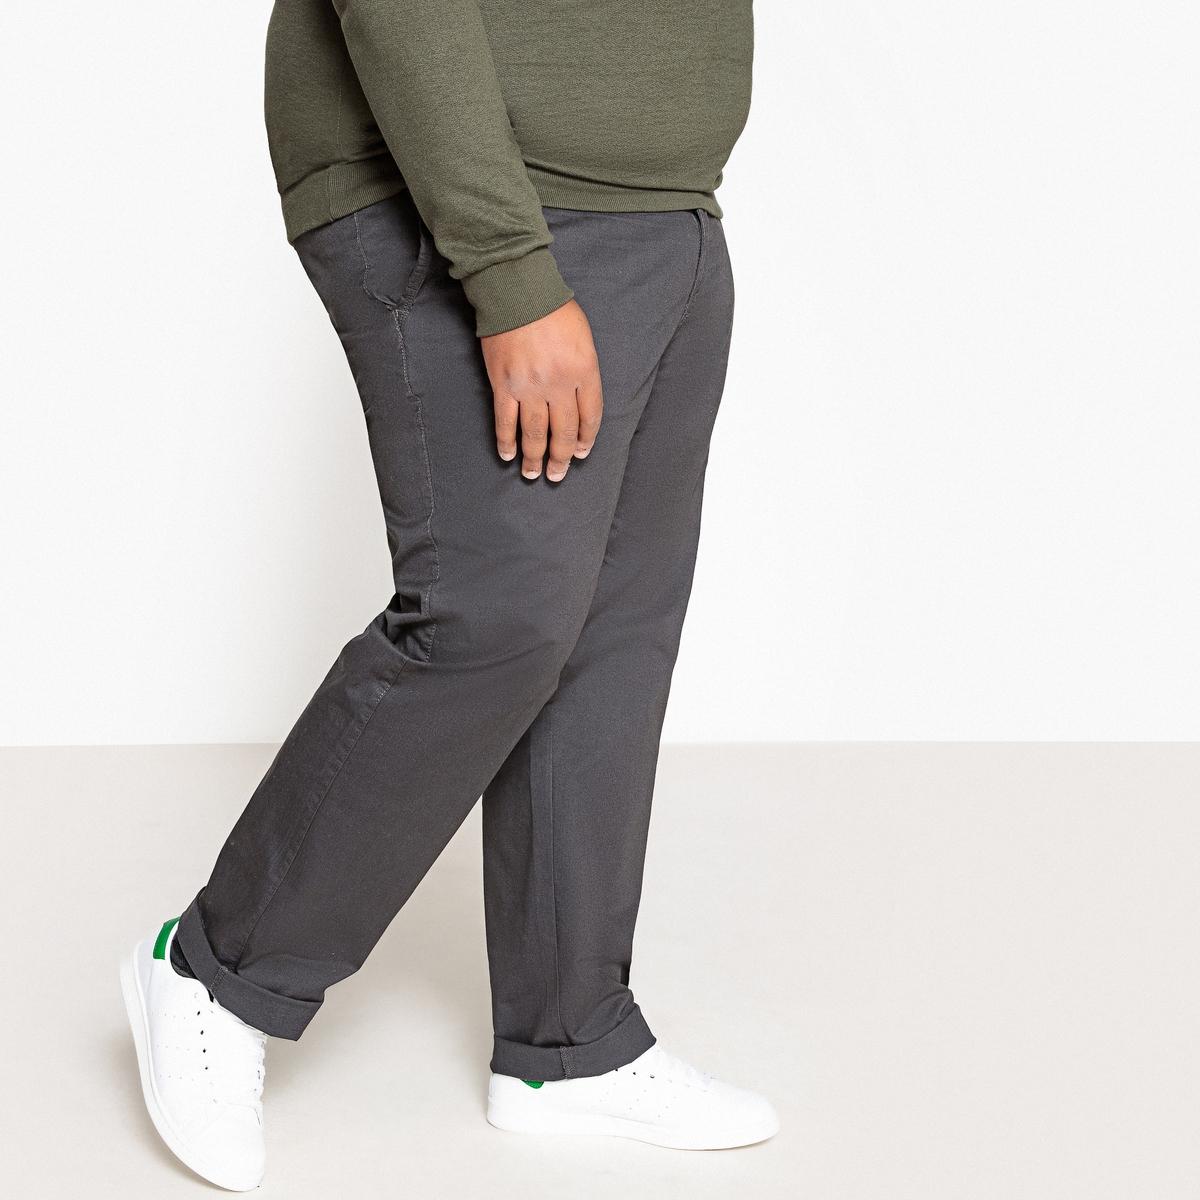 Pantaloni chino stretch L.1 (meno di 1m87)